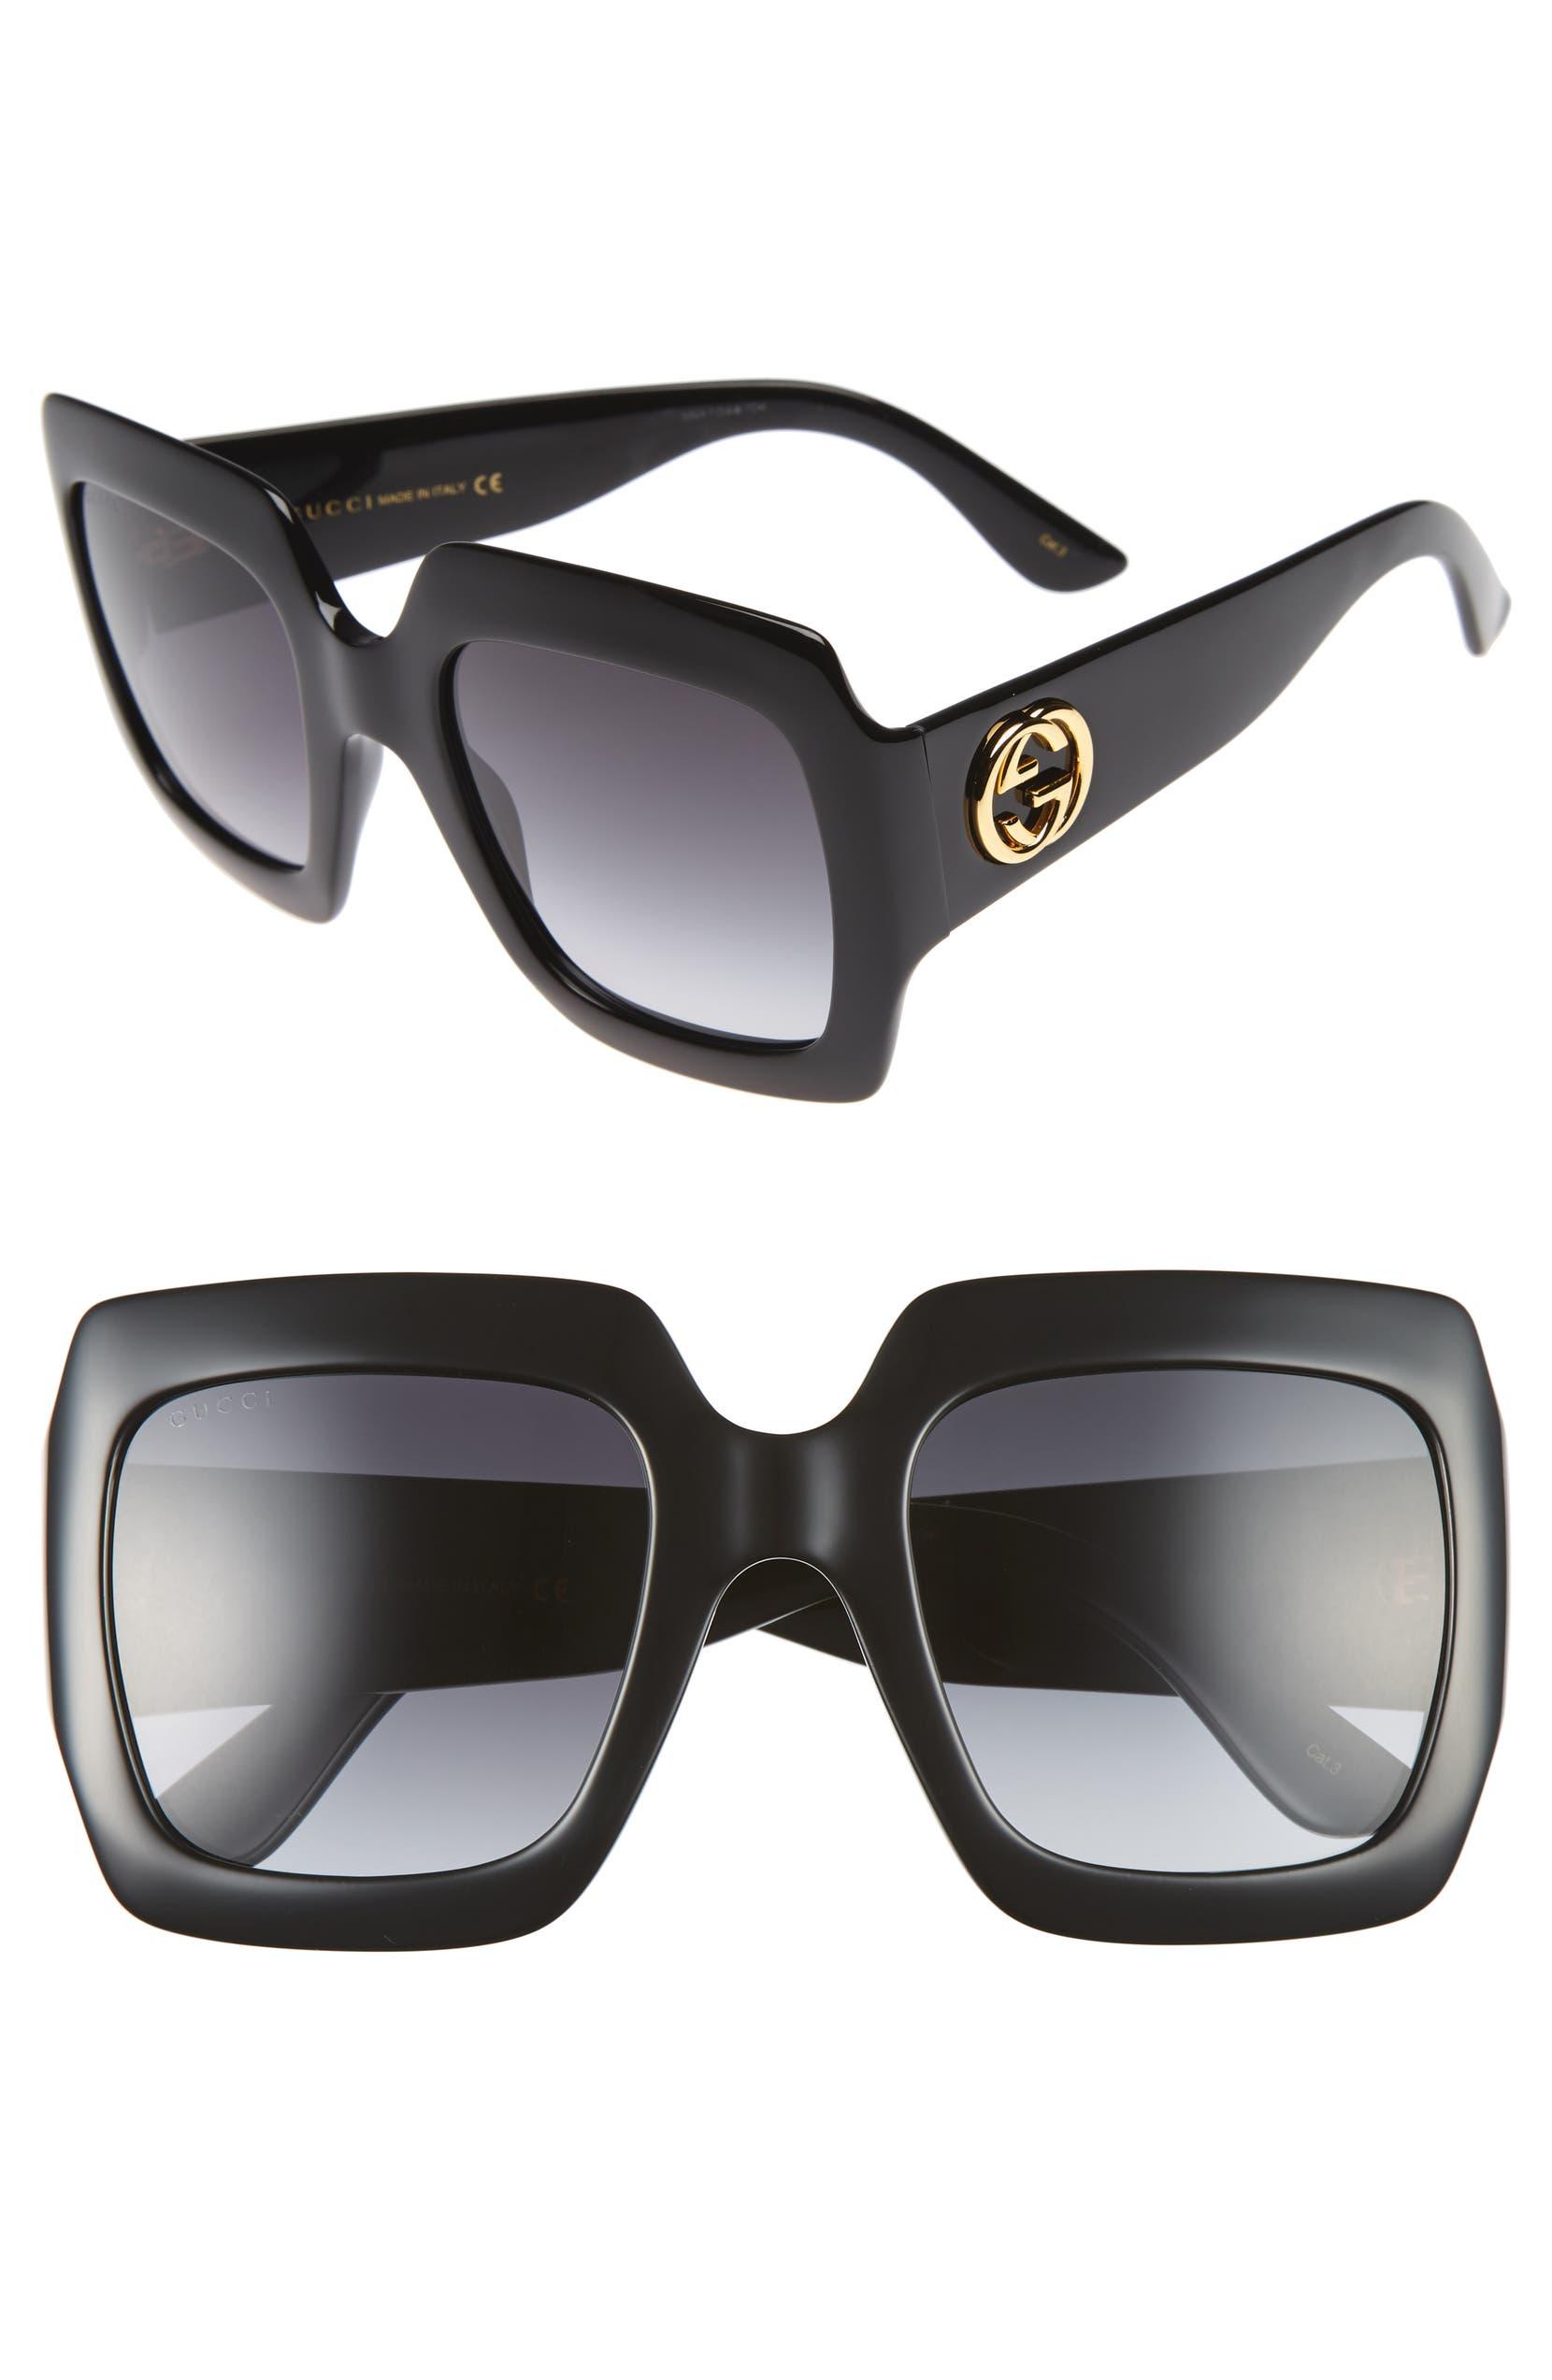 5a25a1d2165 54mm Square Sunglasses